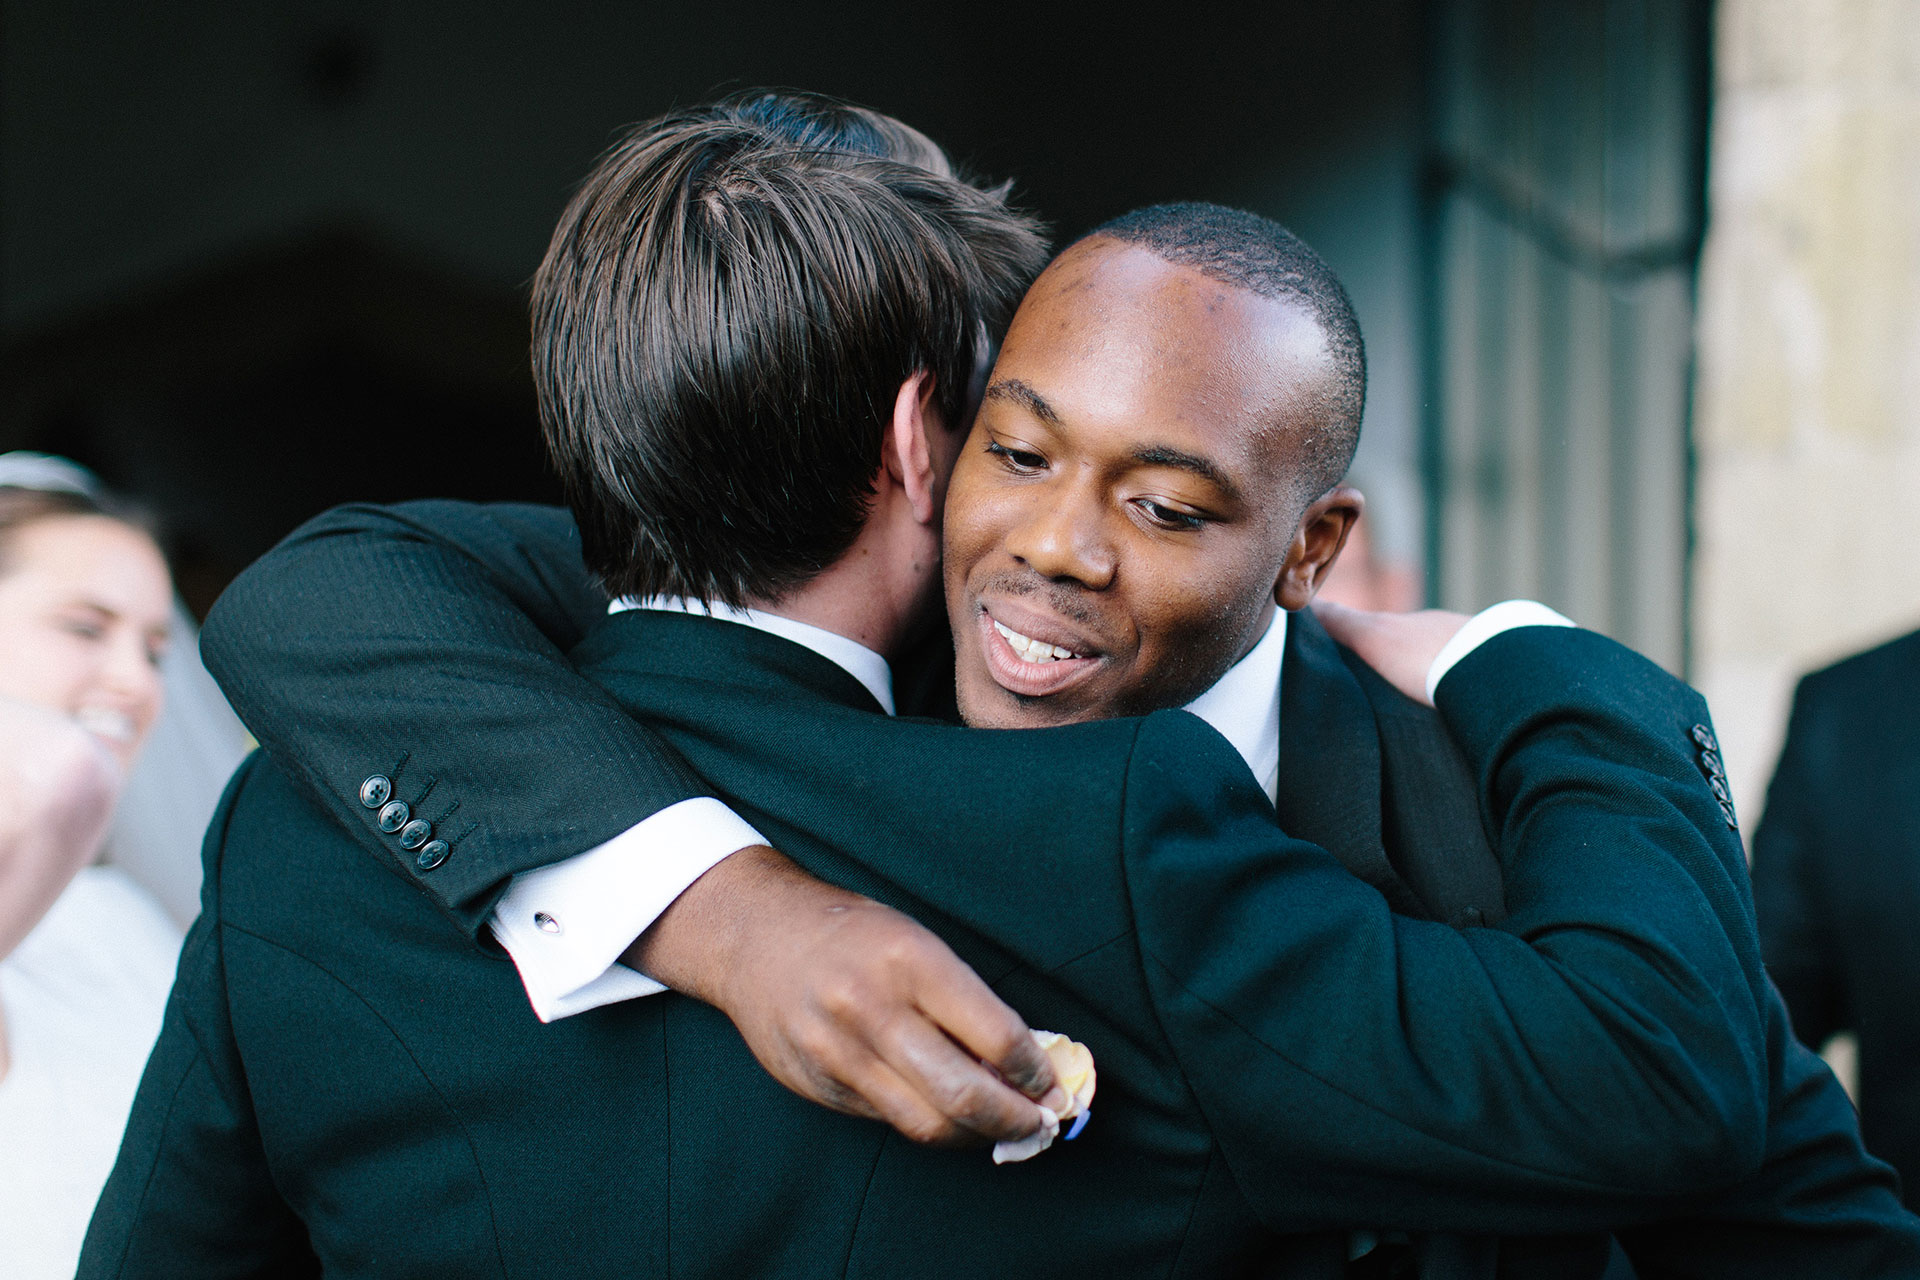 Langar-Hall-wedding-photographer-in-Nottinghamshire-Michael-Newington-Gray-48.jpg